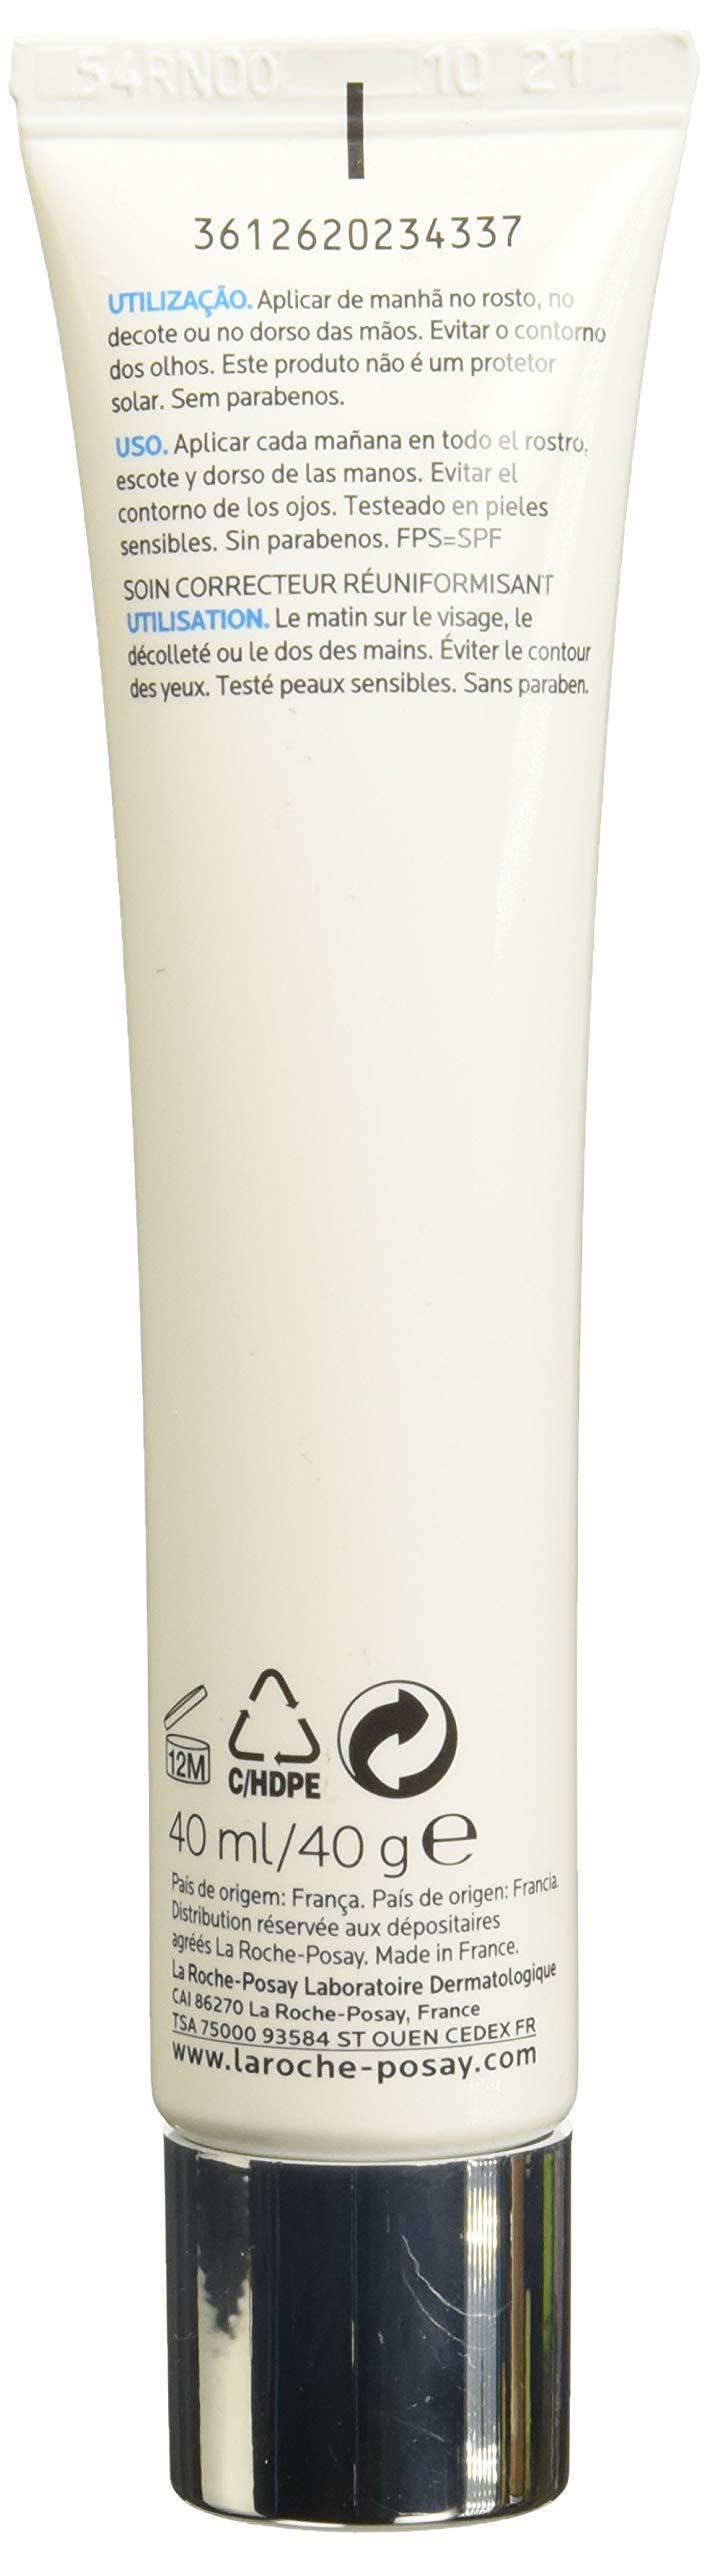 La Roche Posay Pigmentaclar, Cuidado Anti-Manchas, UV LSF 30, 40 ml